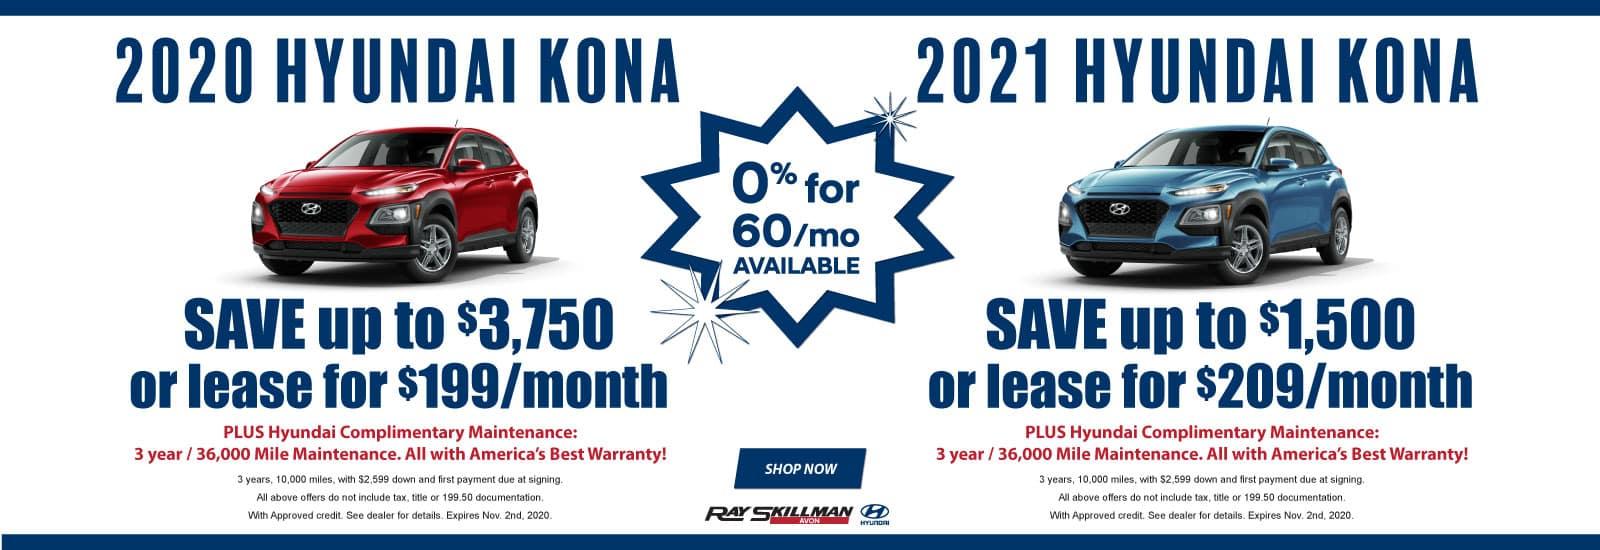 2020-&-2021-Hyundai-Kona-Web-Banner-1600×500